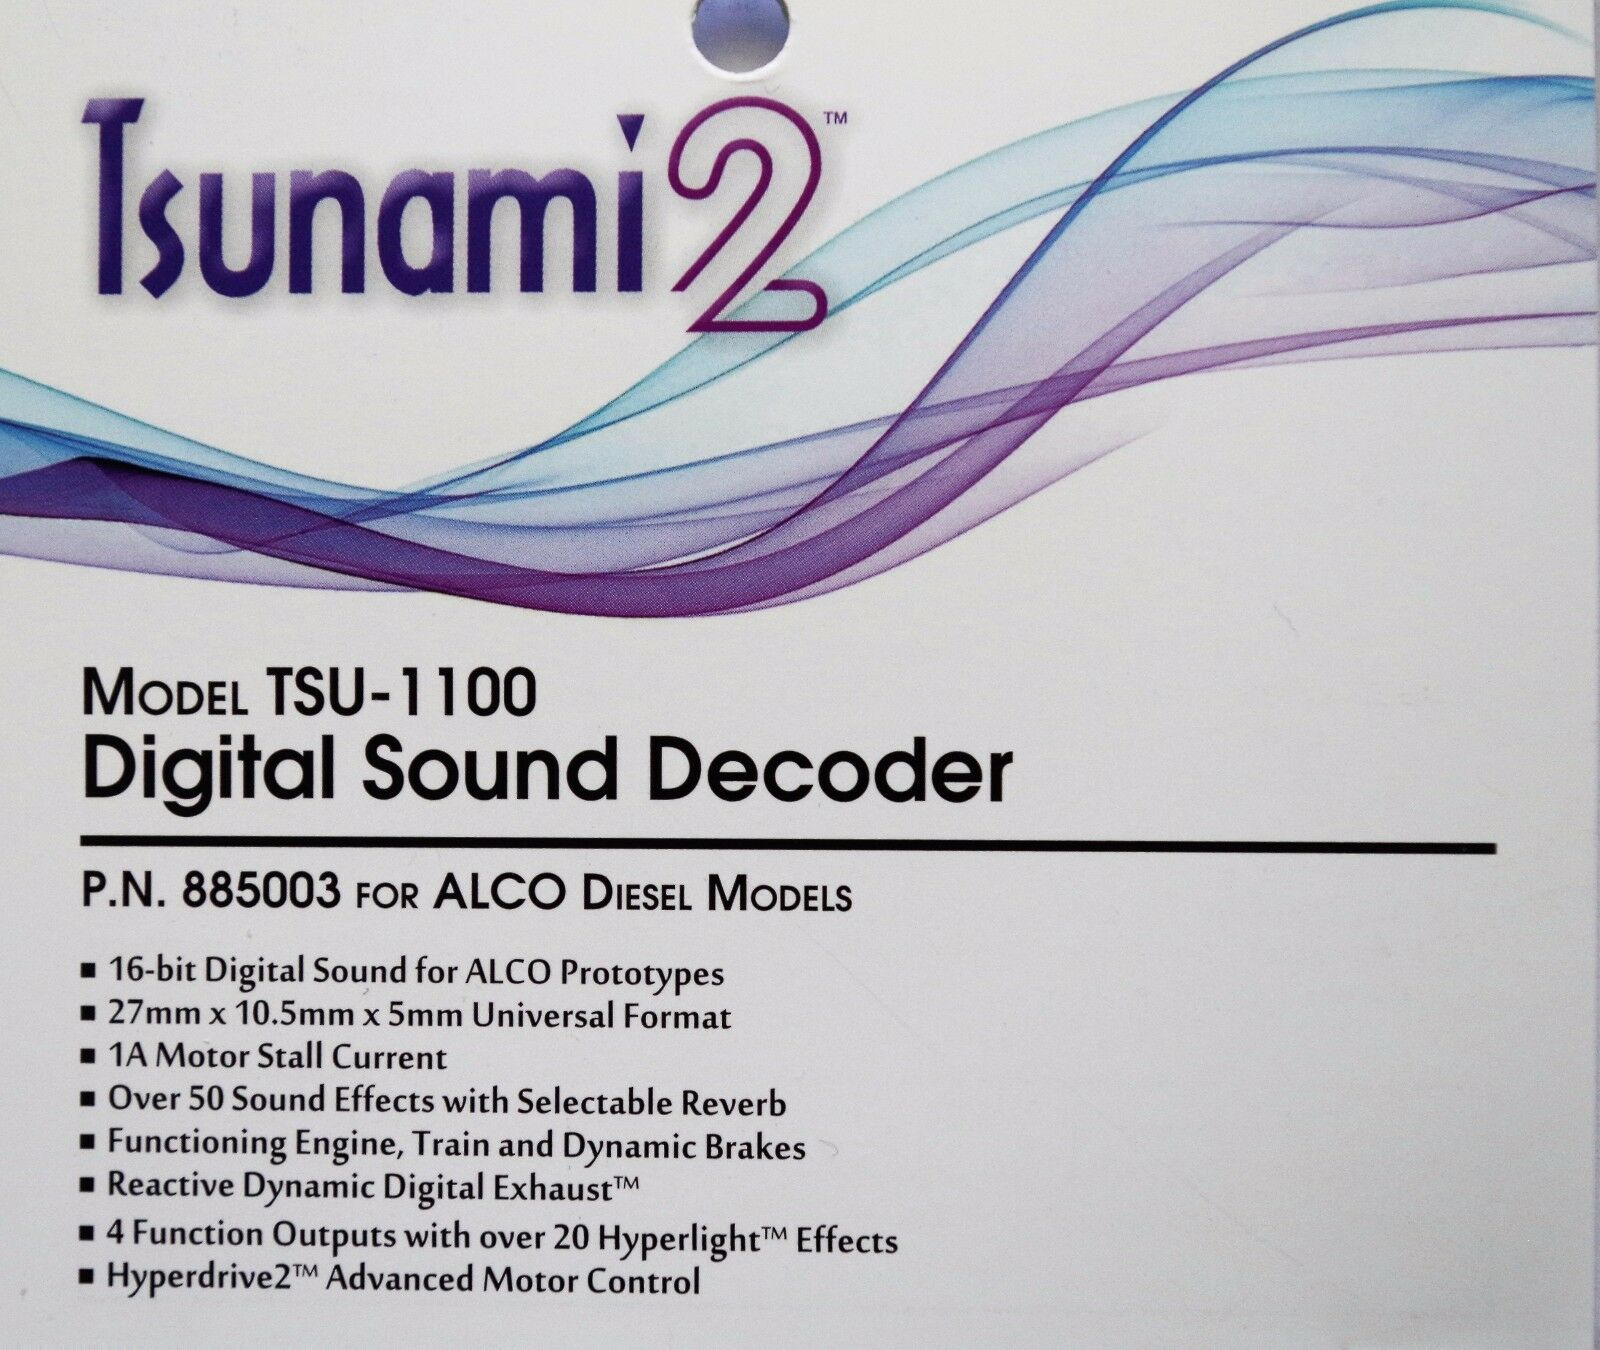 DCC decoder Soundtraxx TSU-1100 Tsunami2 Digital Sound Decoder for ALCO Diesels